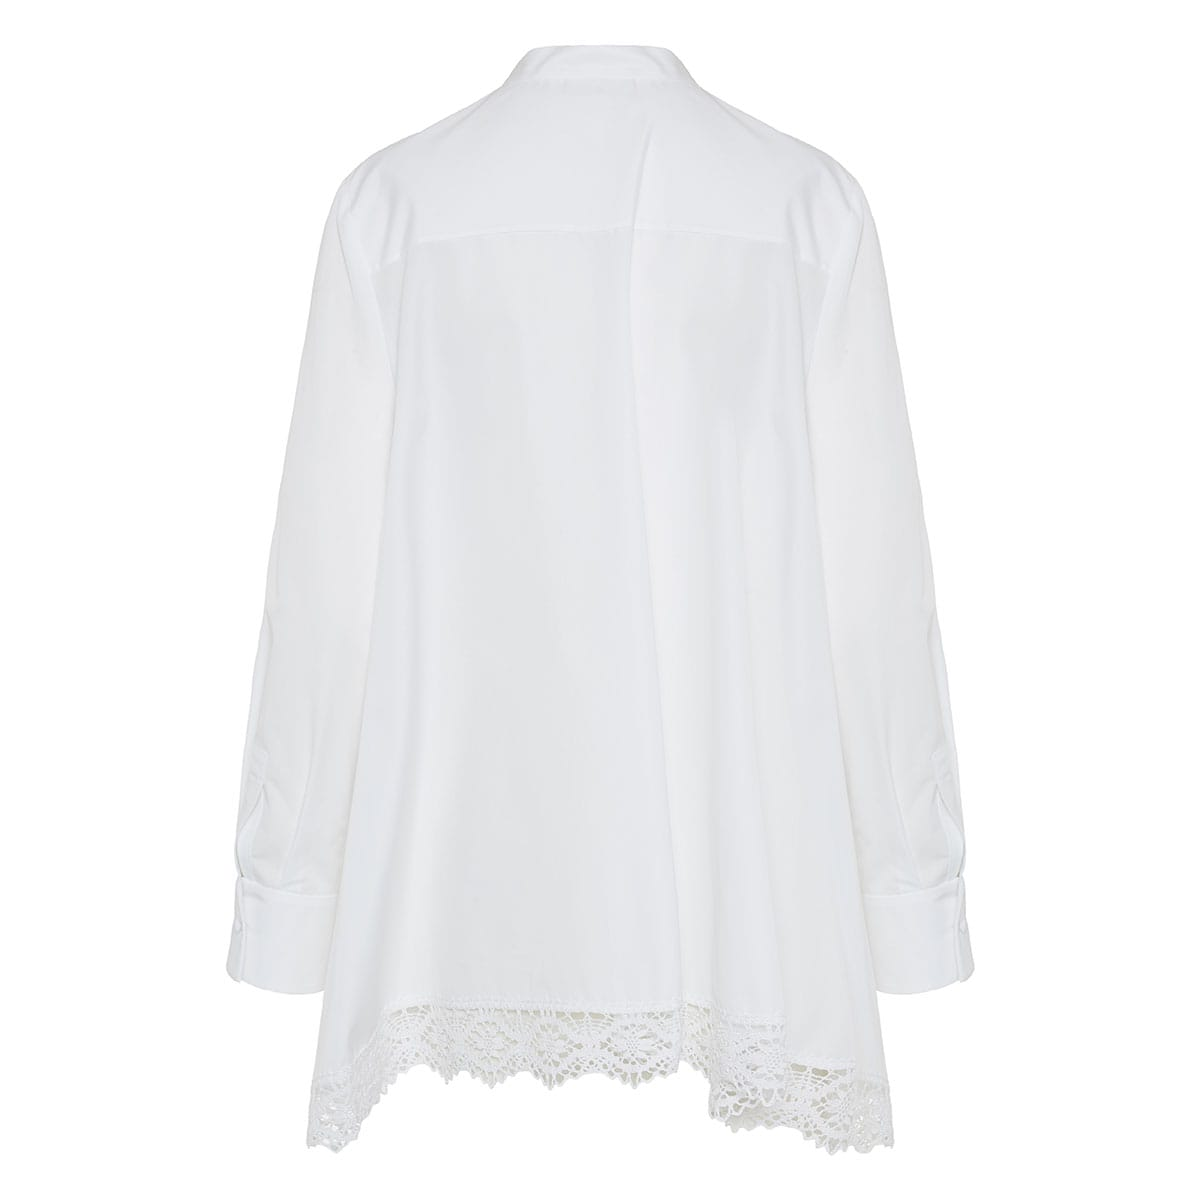 Lace-trimmed asymmetric draped shirt